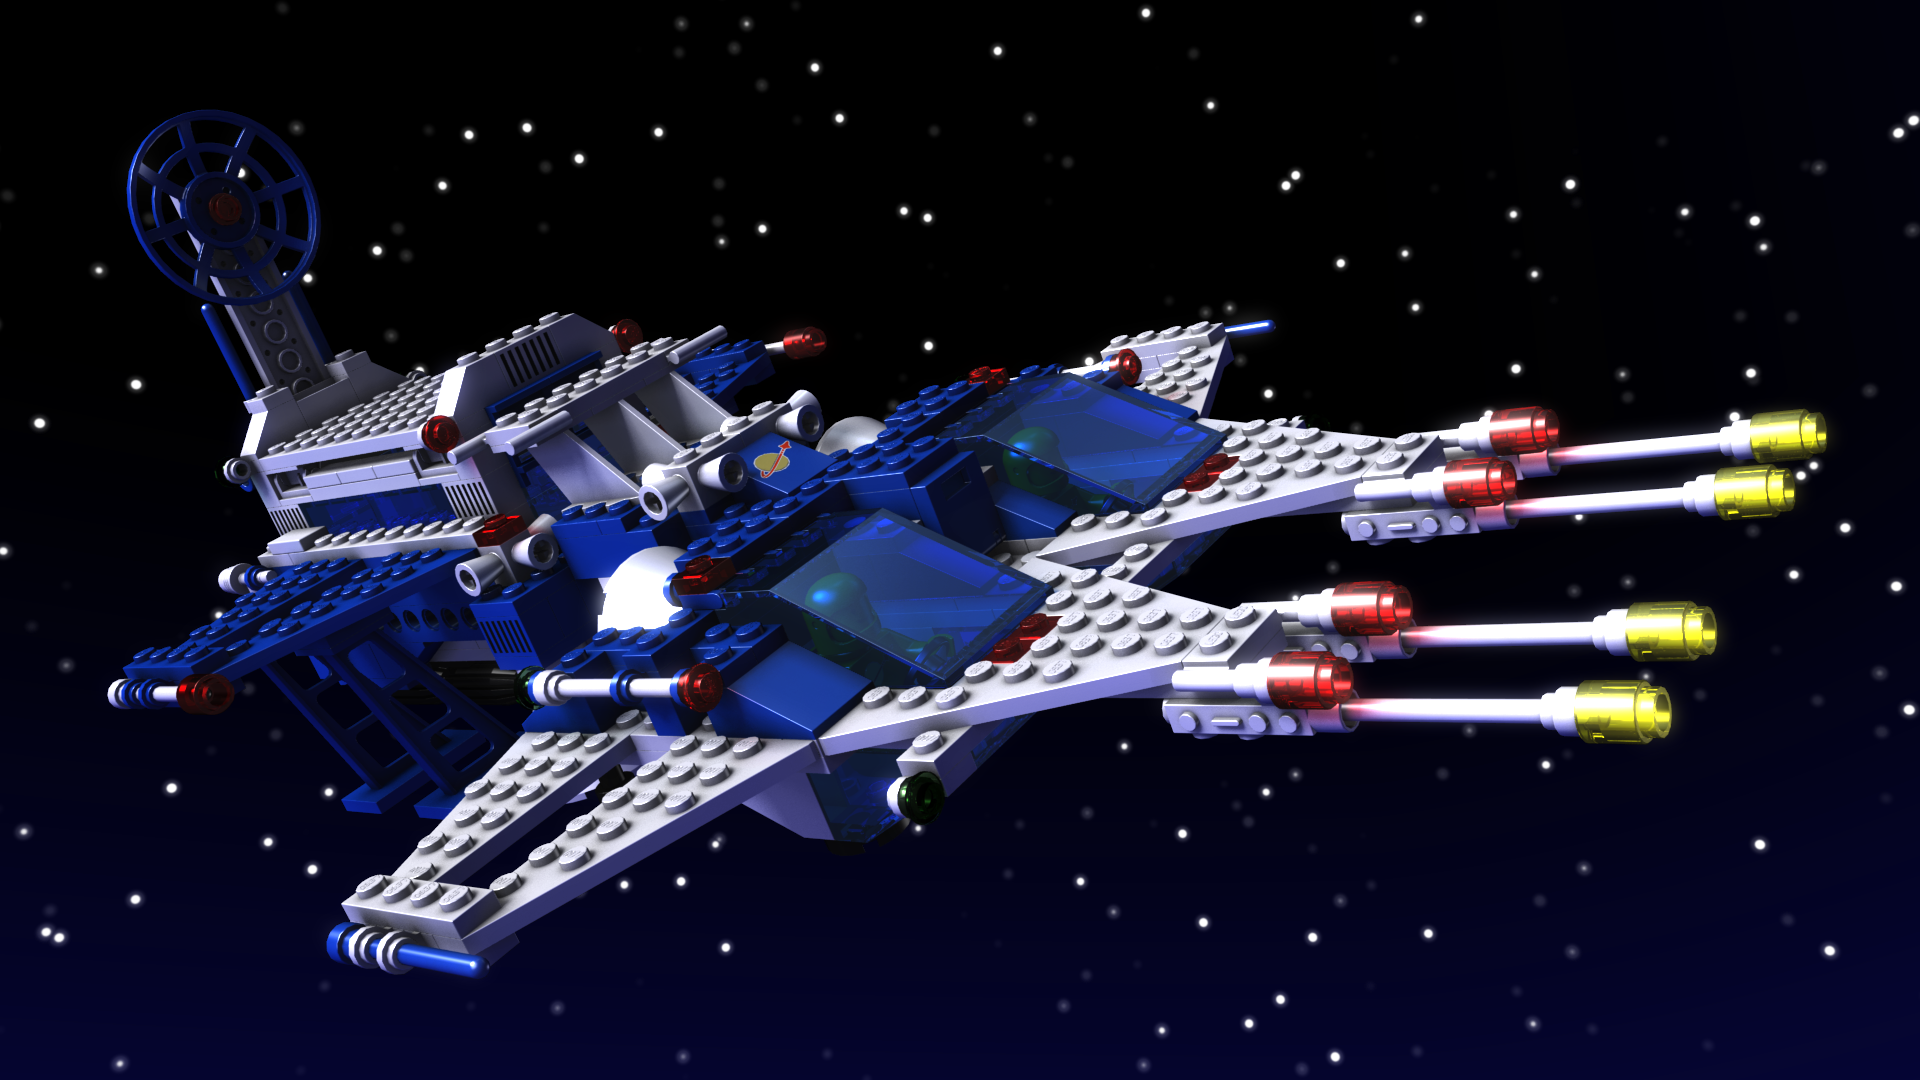 lego 6980 galaxy commanderzpaolo on deviantart